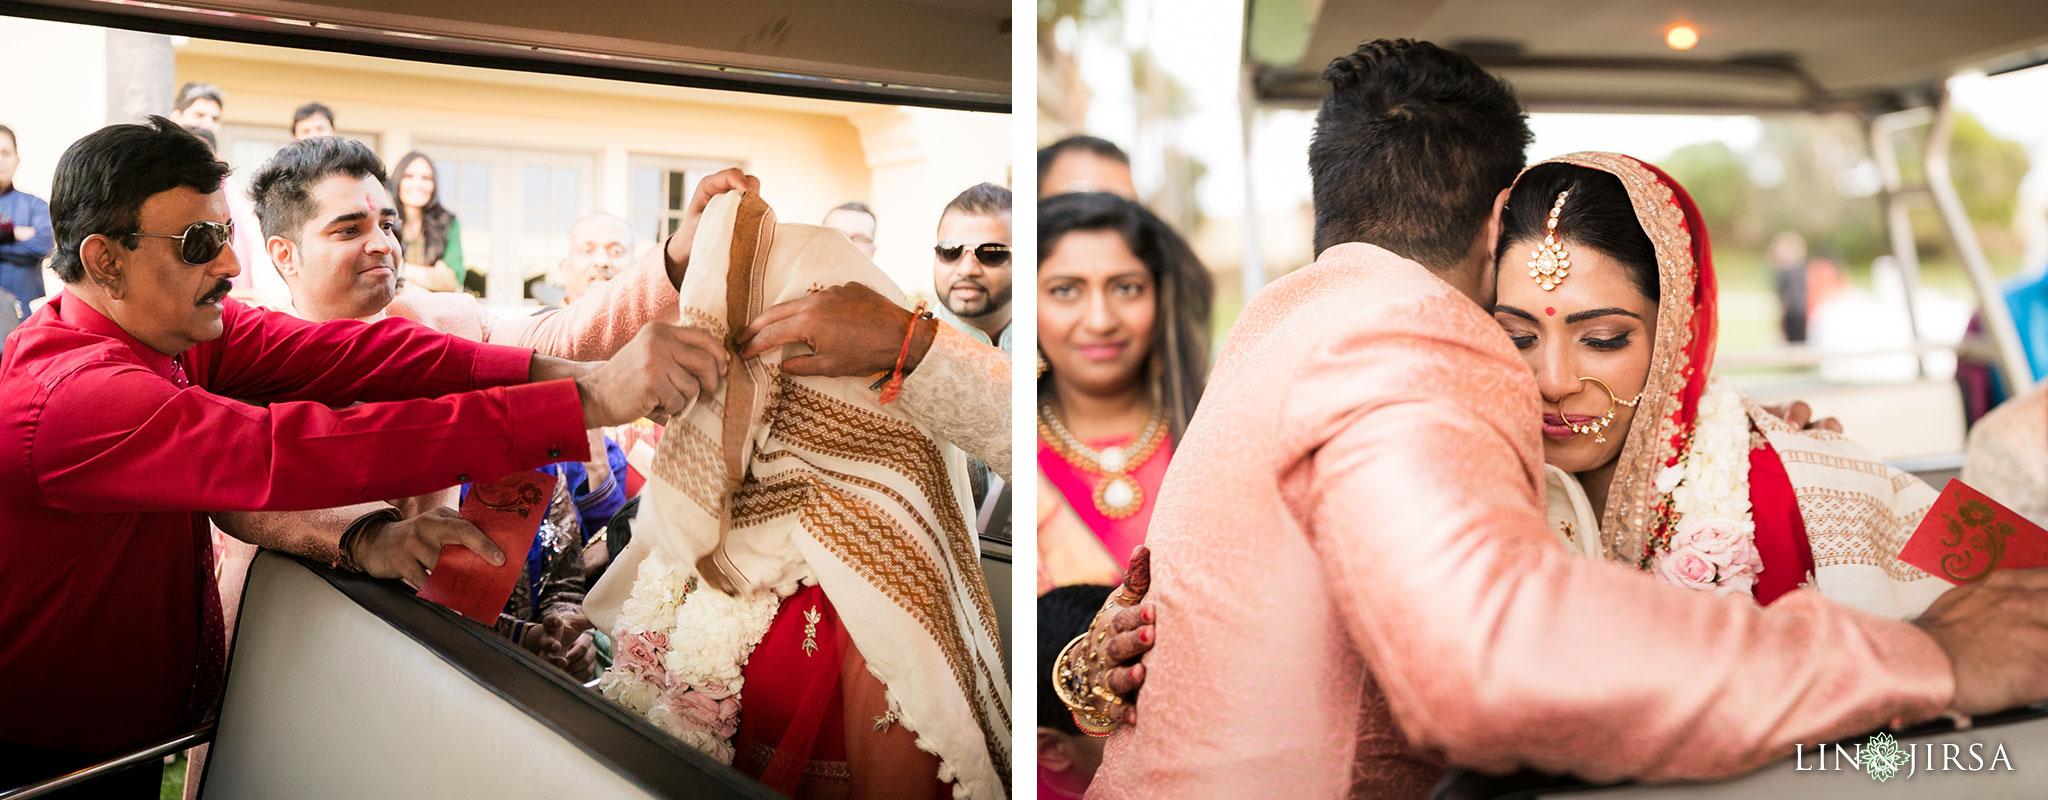 29 ritz carlton laguna niguel indian wedding ceremony vidhai photography